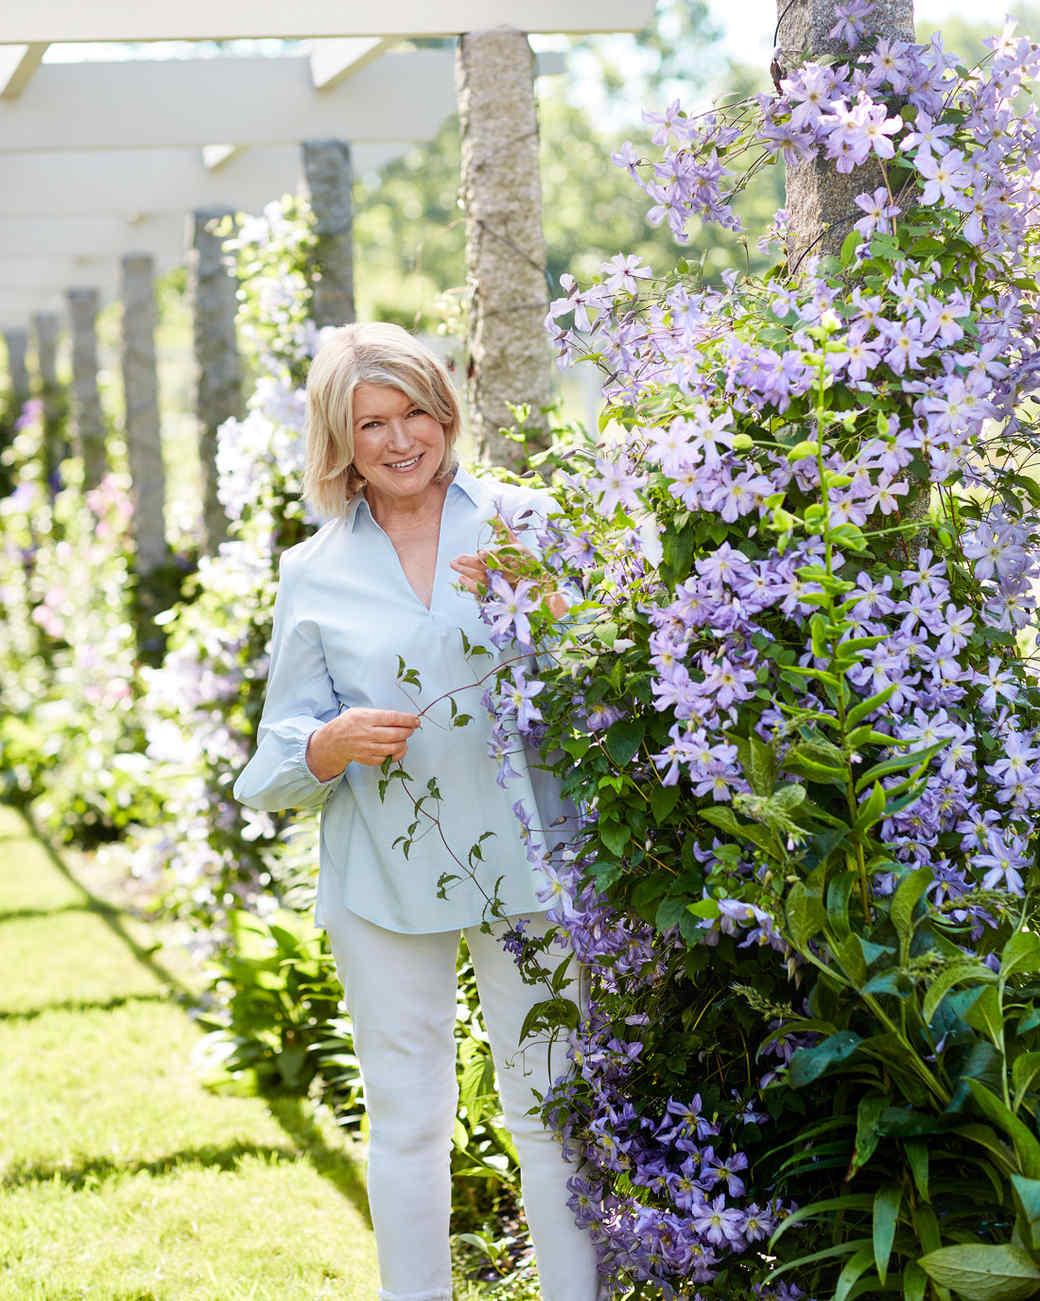 martha standing next to purple flowers